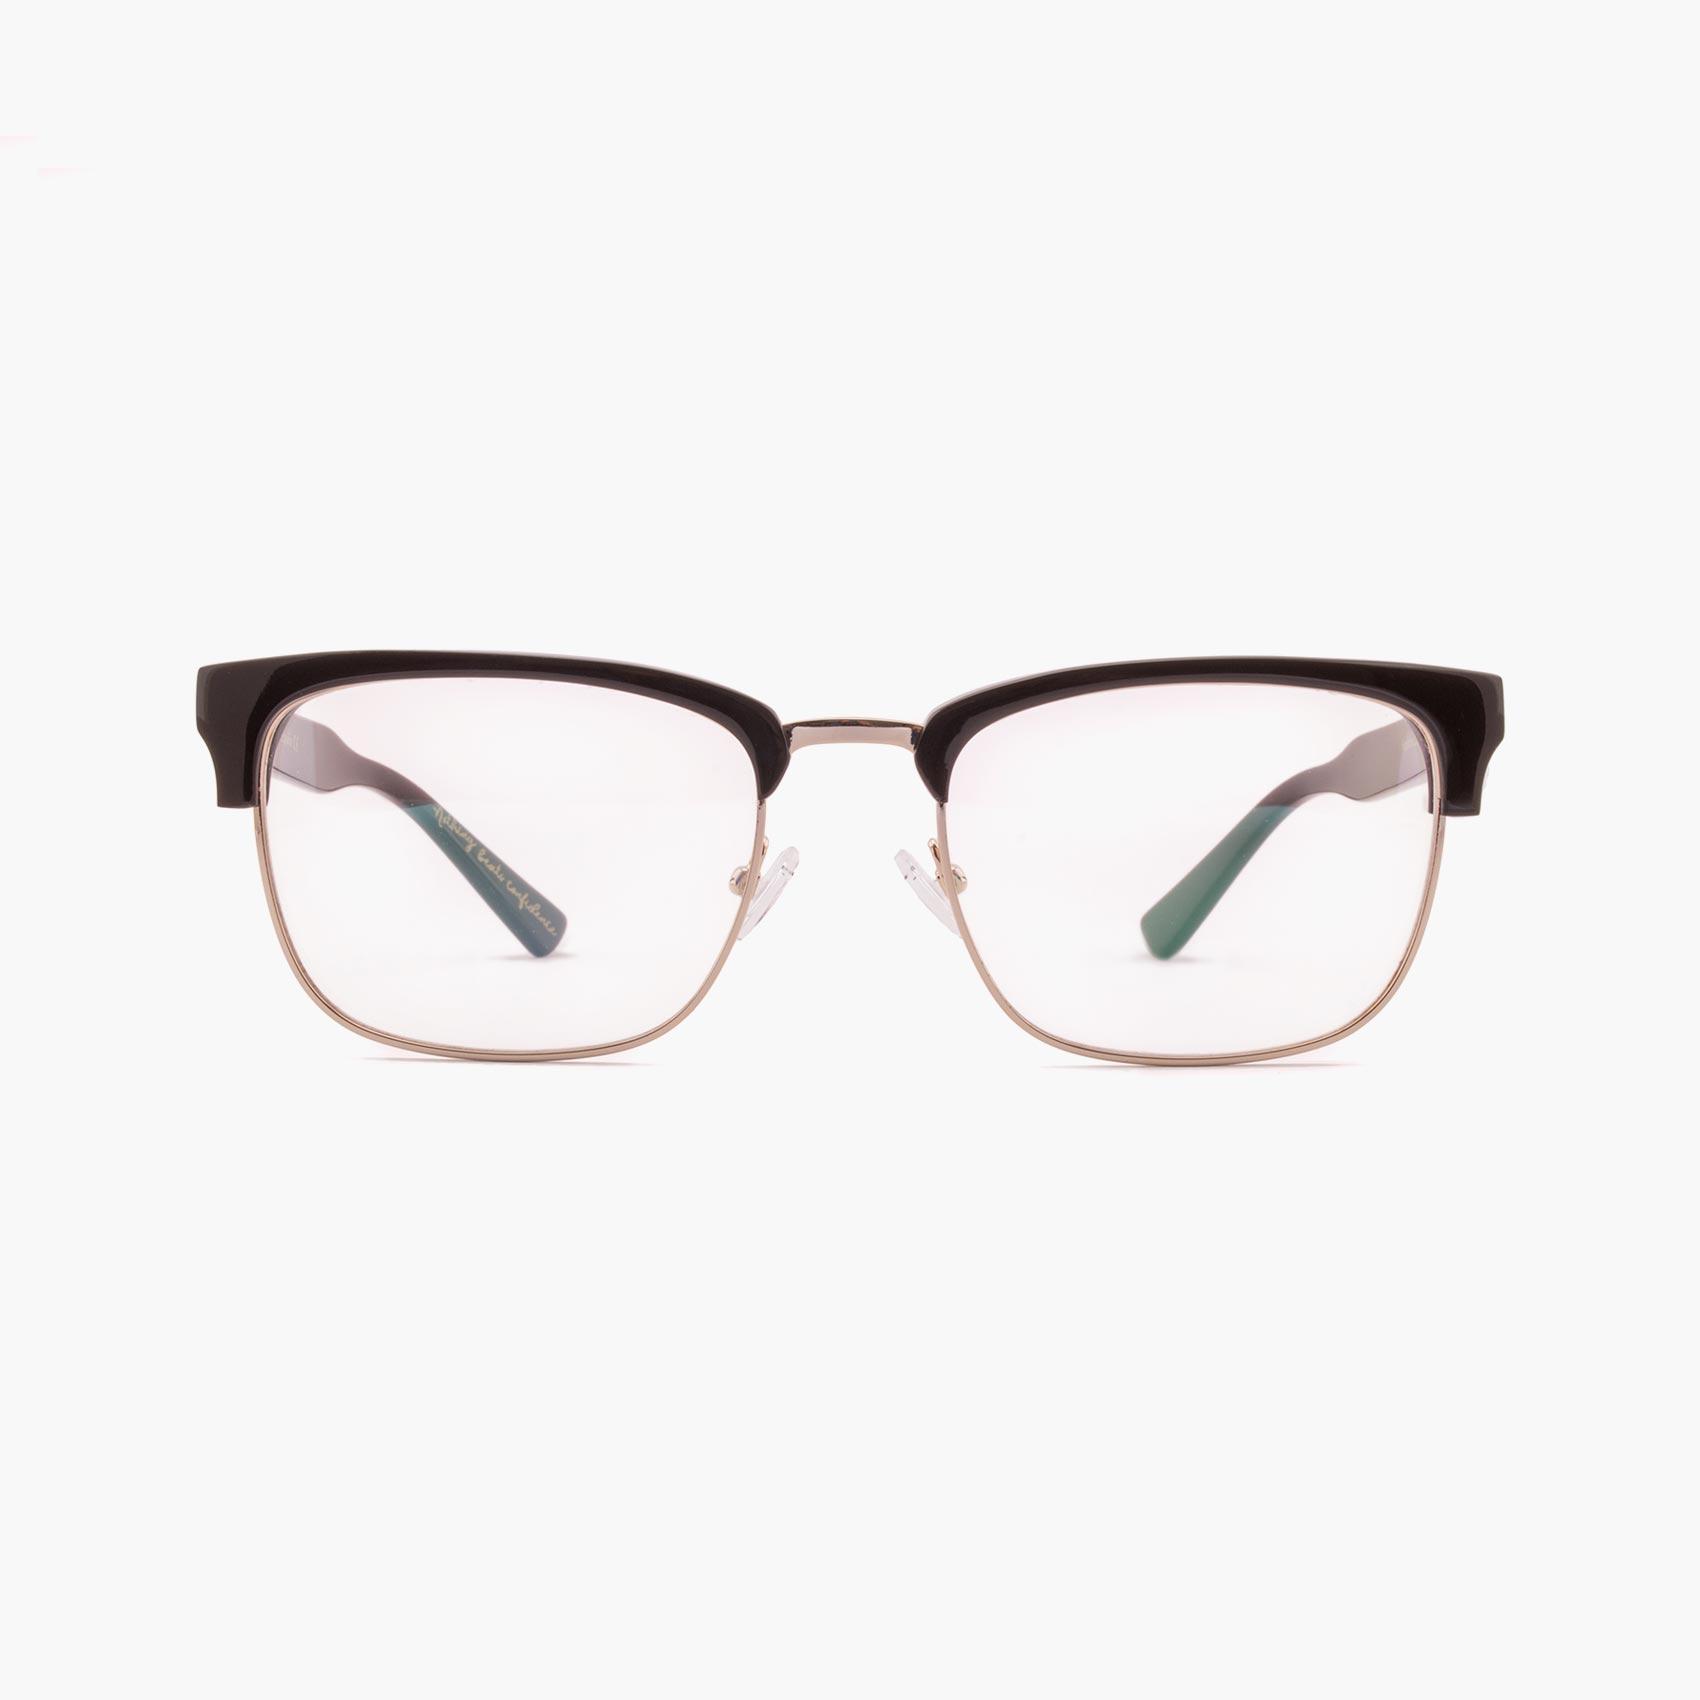 Proud eyewear Hopkins C2 F gafas graduadas clubmaster negras